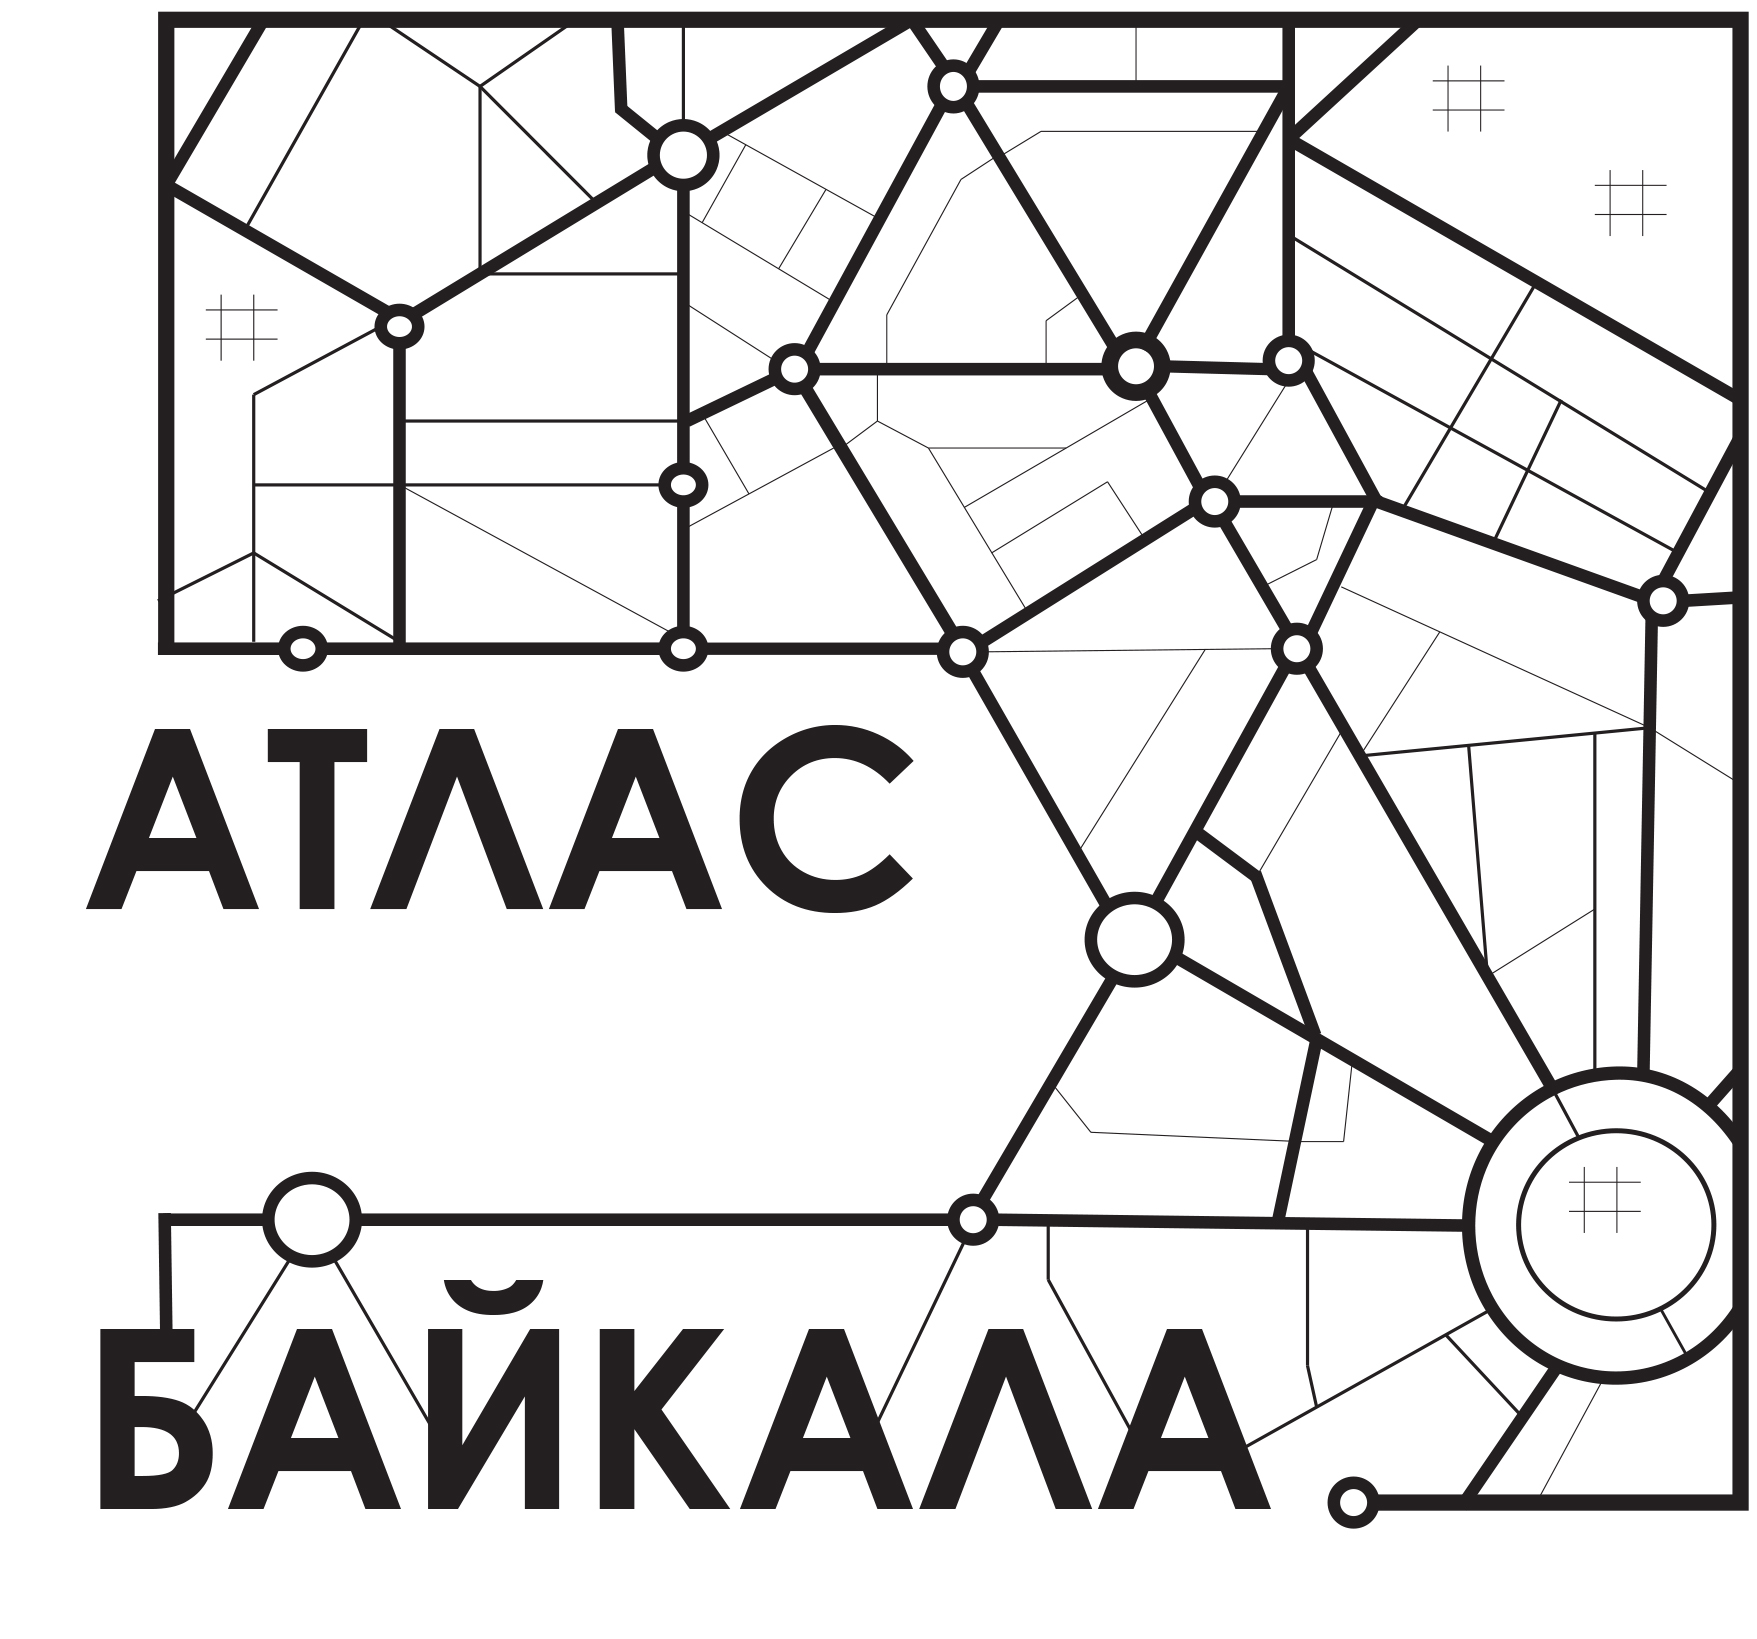 Разработка логотипа Атлас Байкала фото f_9155b018e222bd3f.jpg